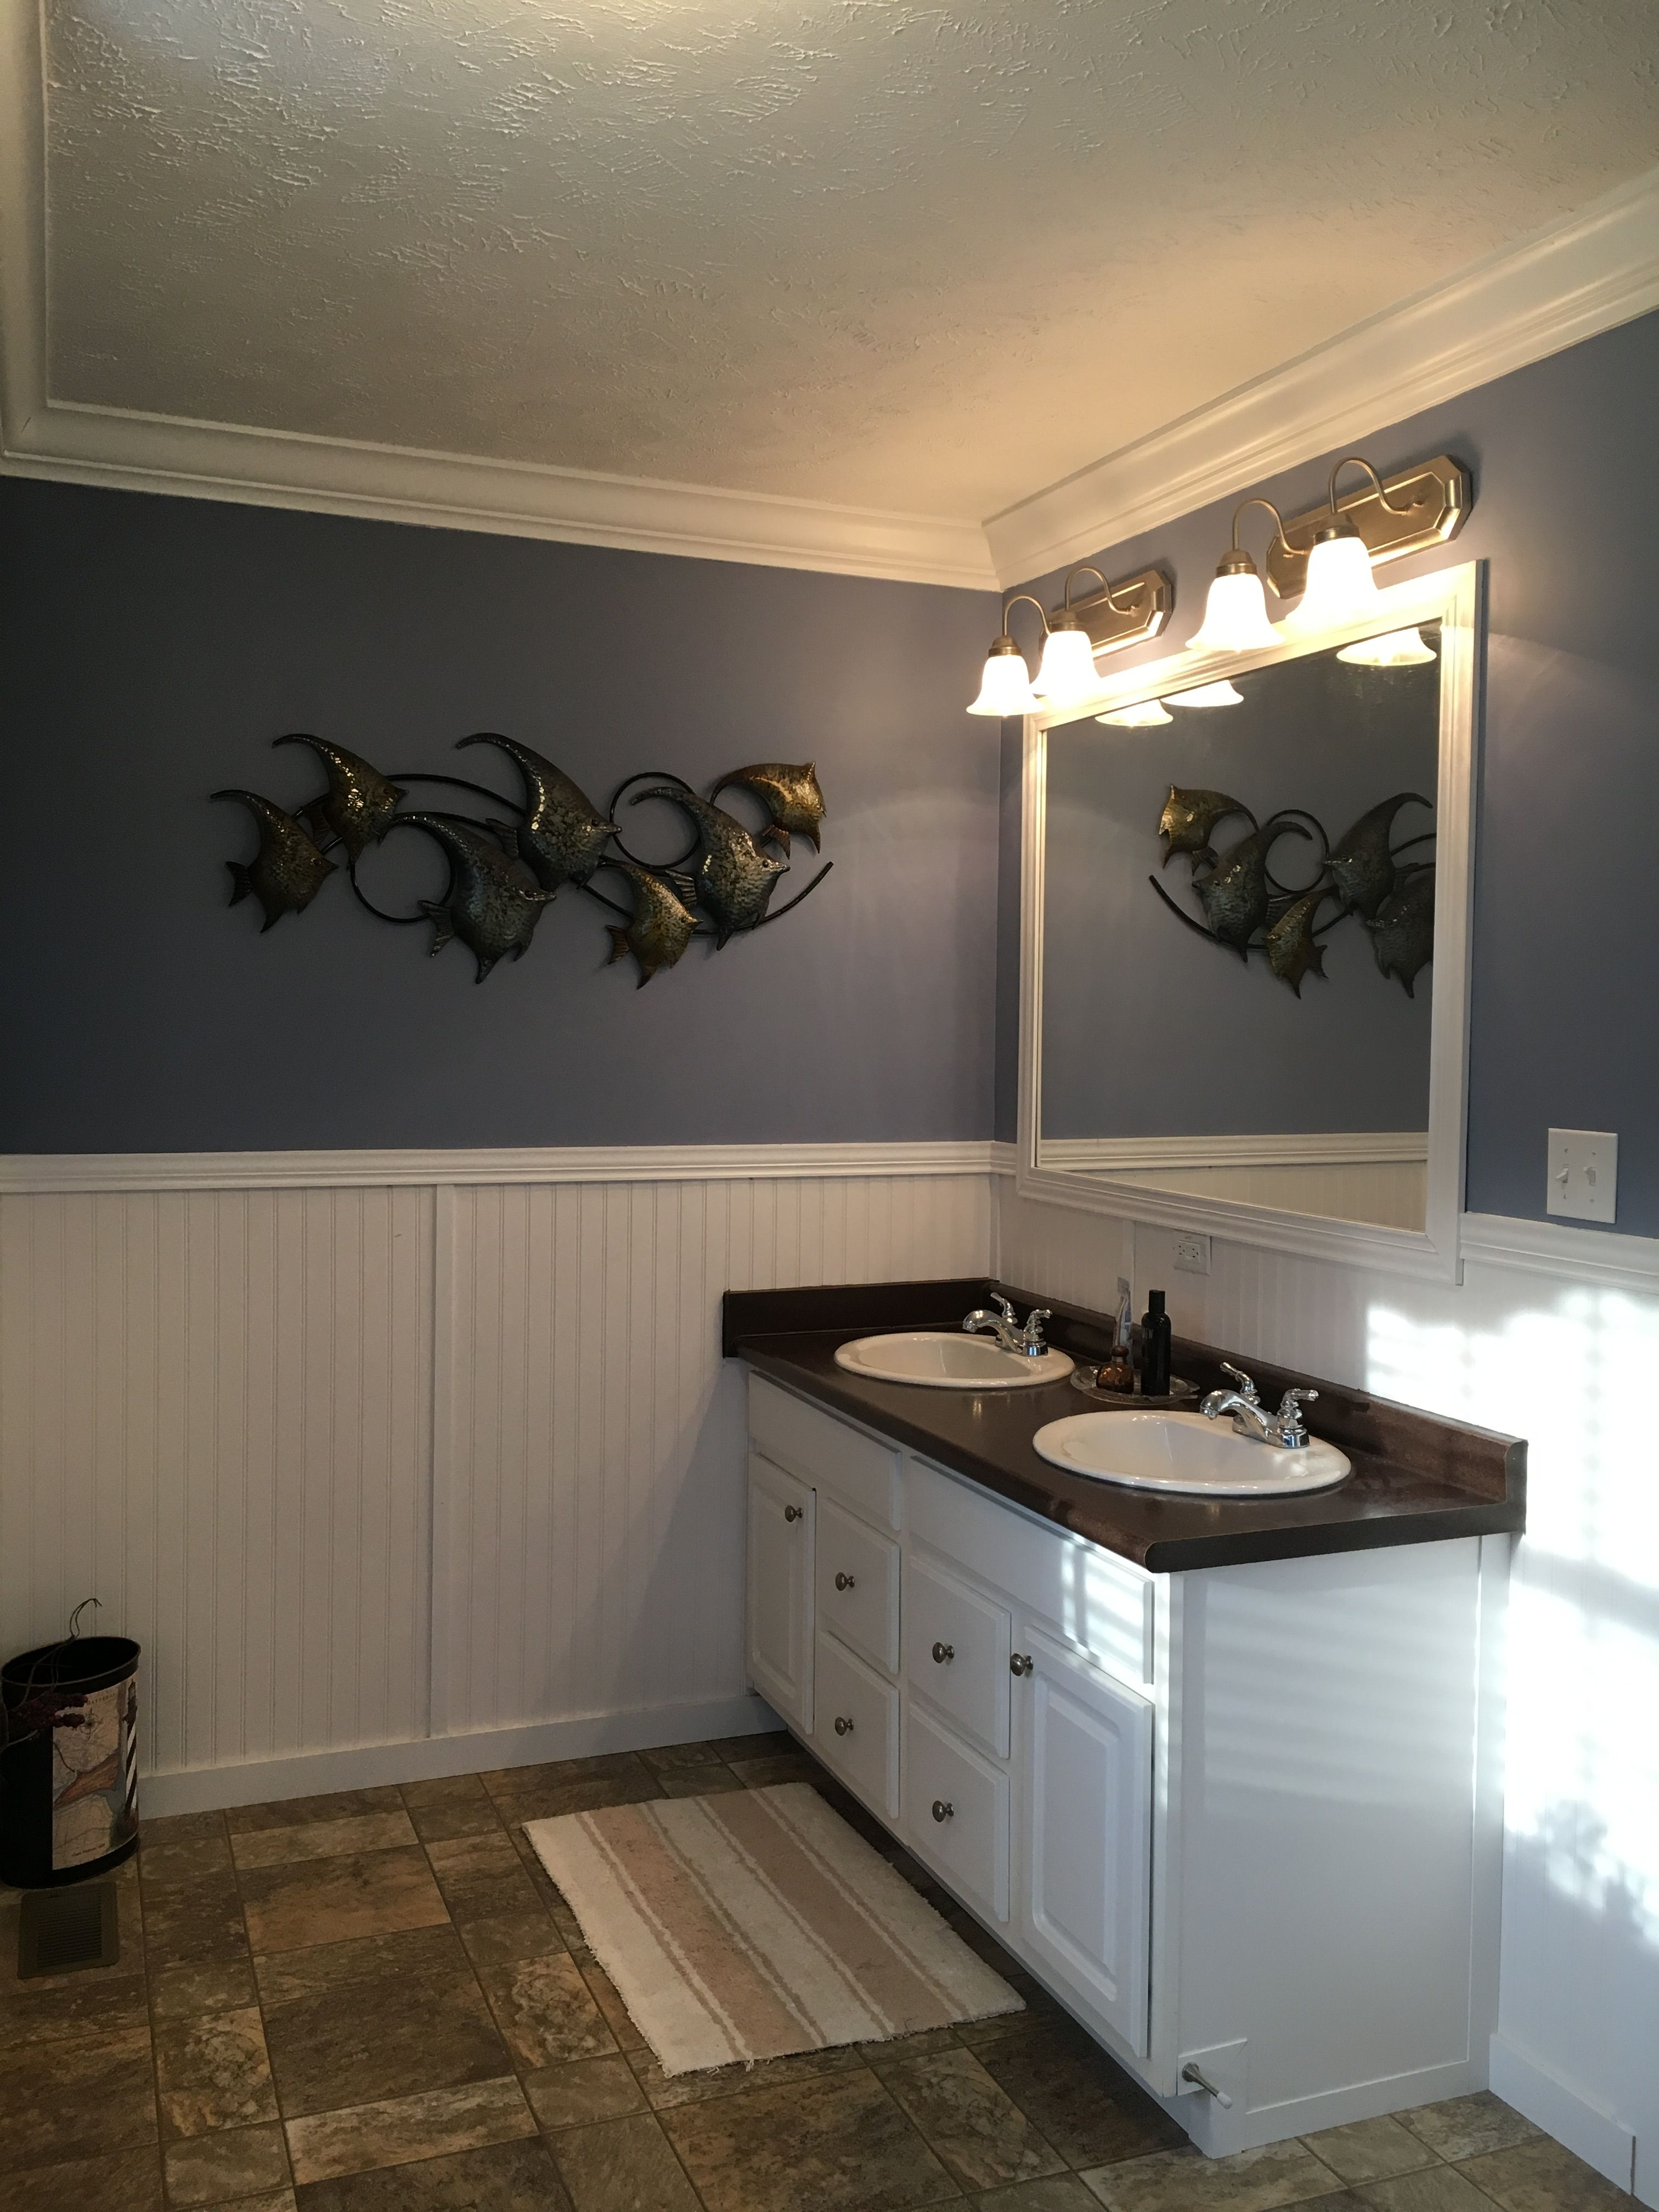 Sherwin Williams Bracing Blue Dining Room Paint Bathroom Paint Colors Blue Blue Bathroom Paint